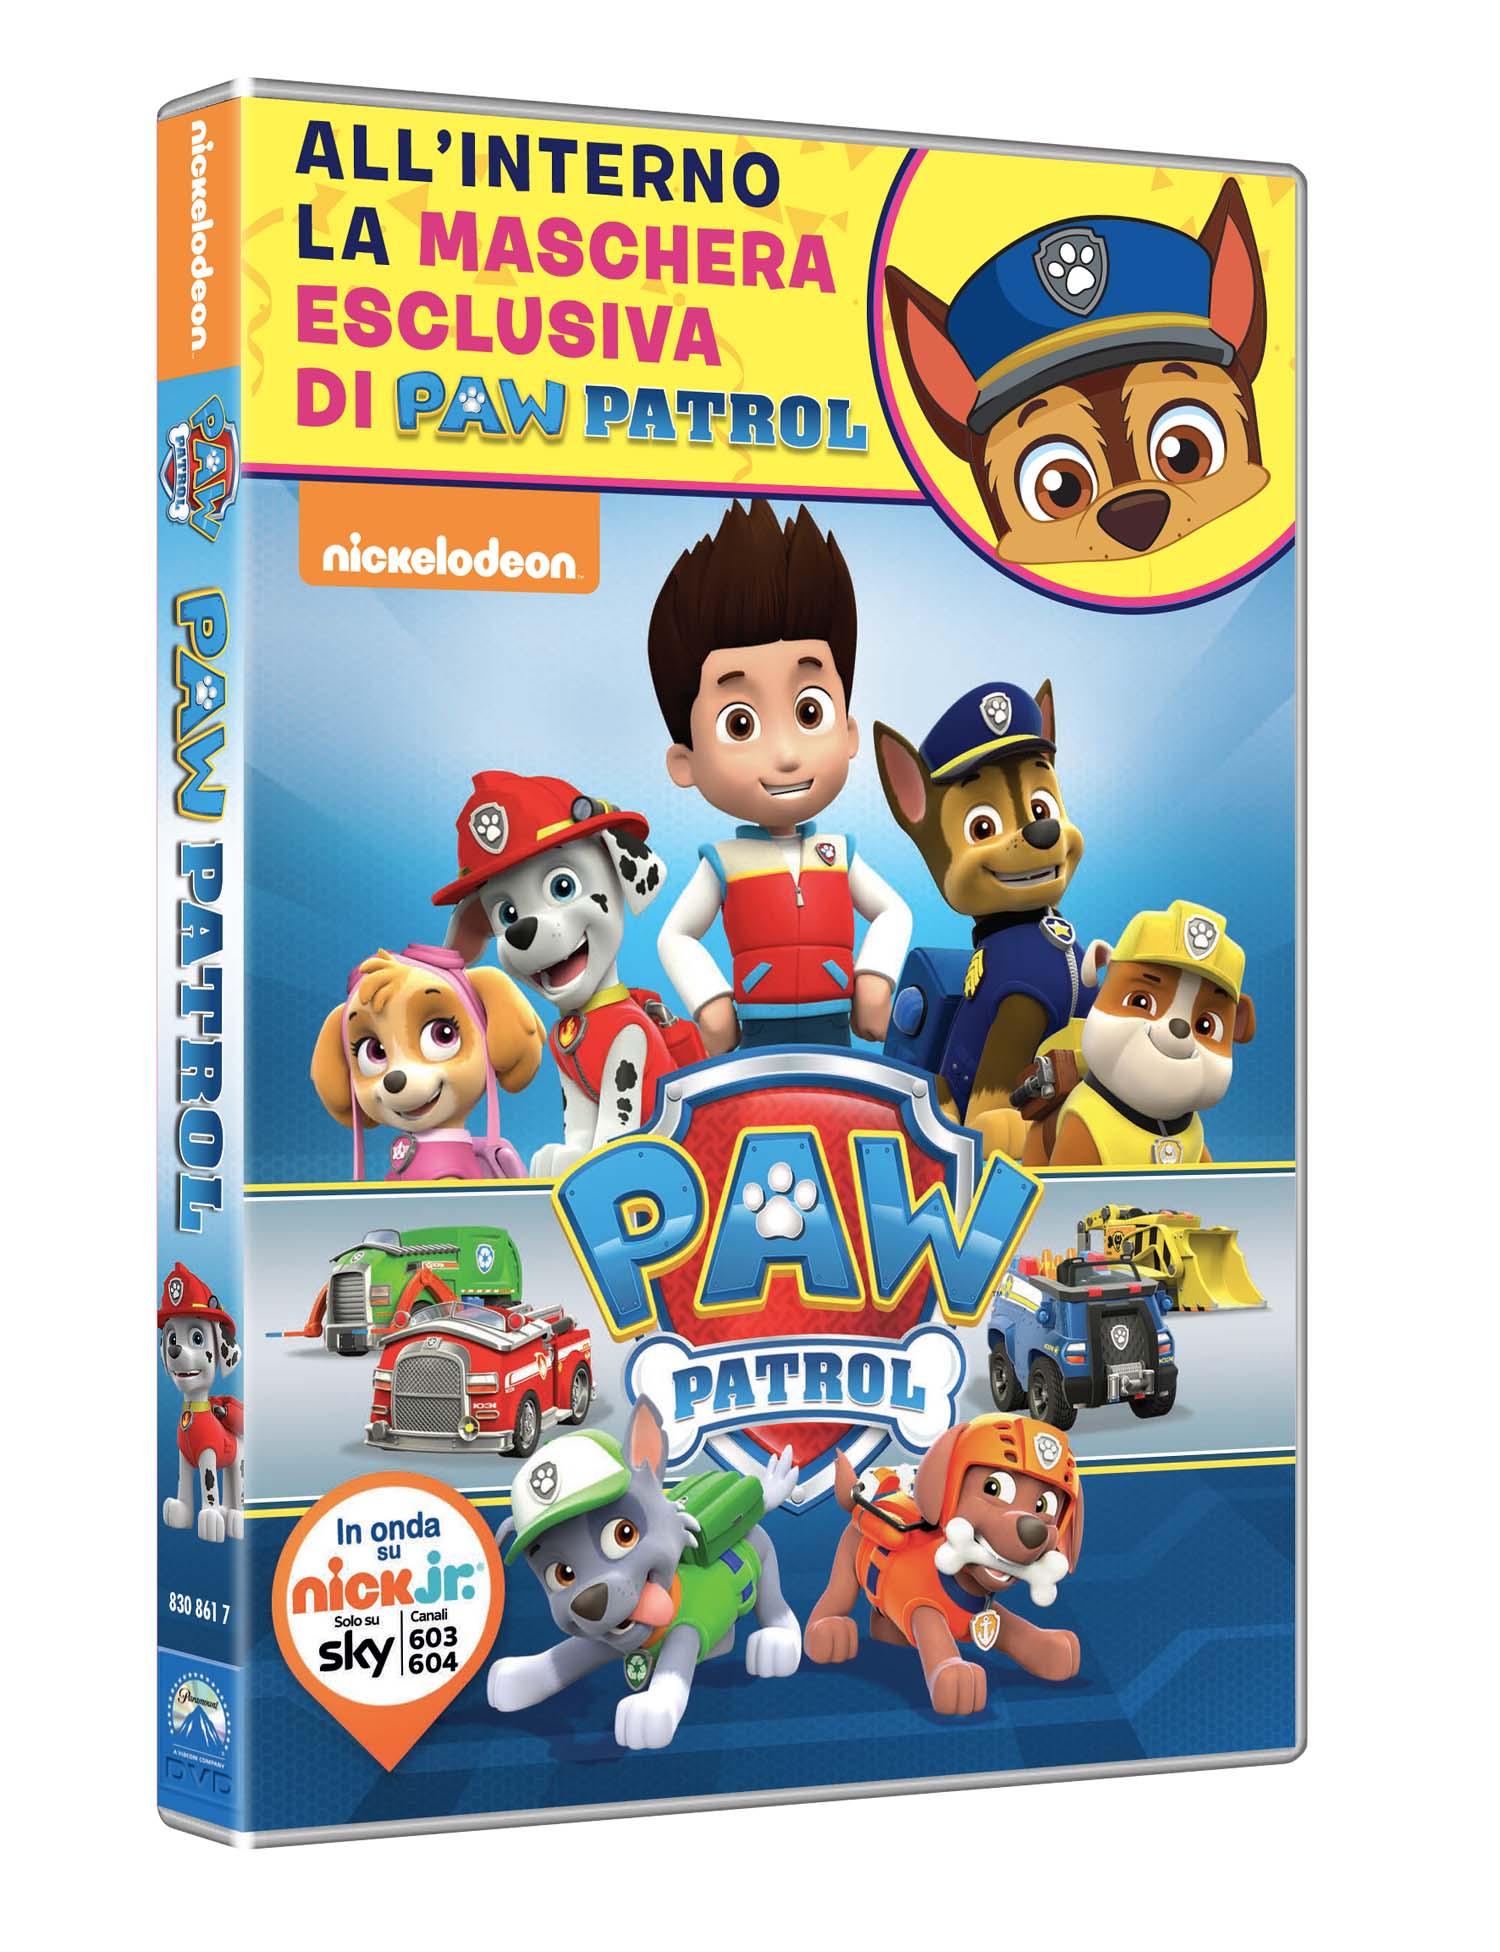 PAW PATROL (DVD + MASCHERA) (CARNEVALE COLLECTION) (DVD)